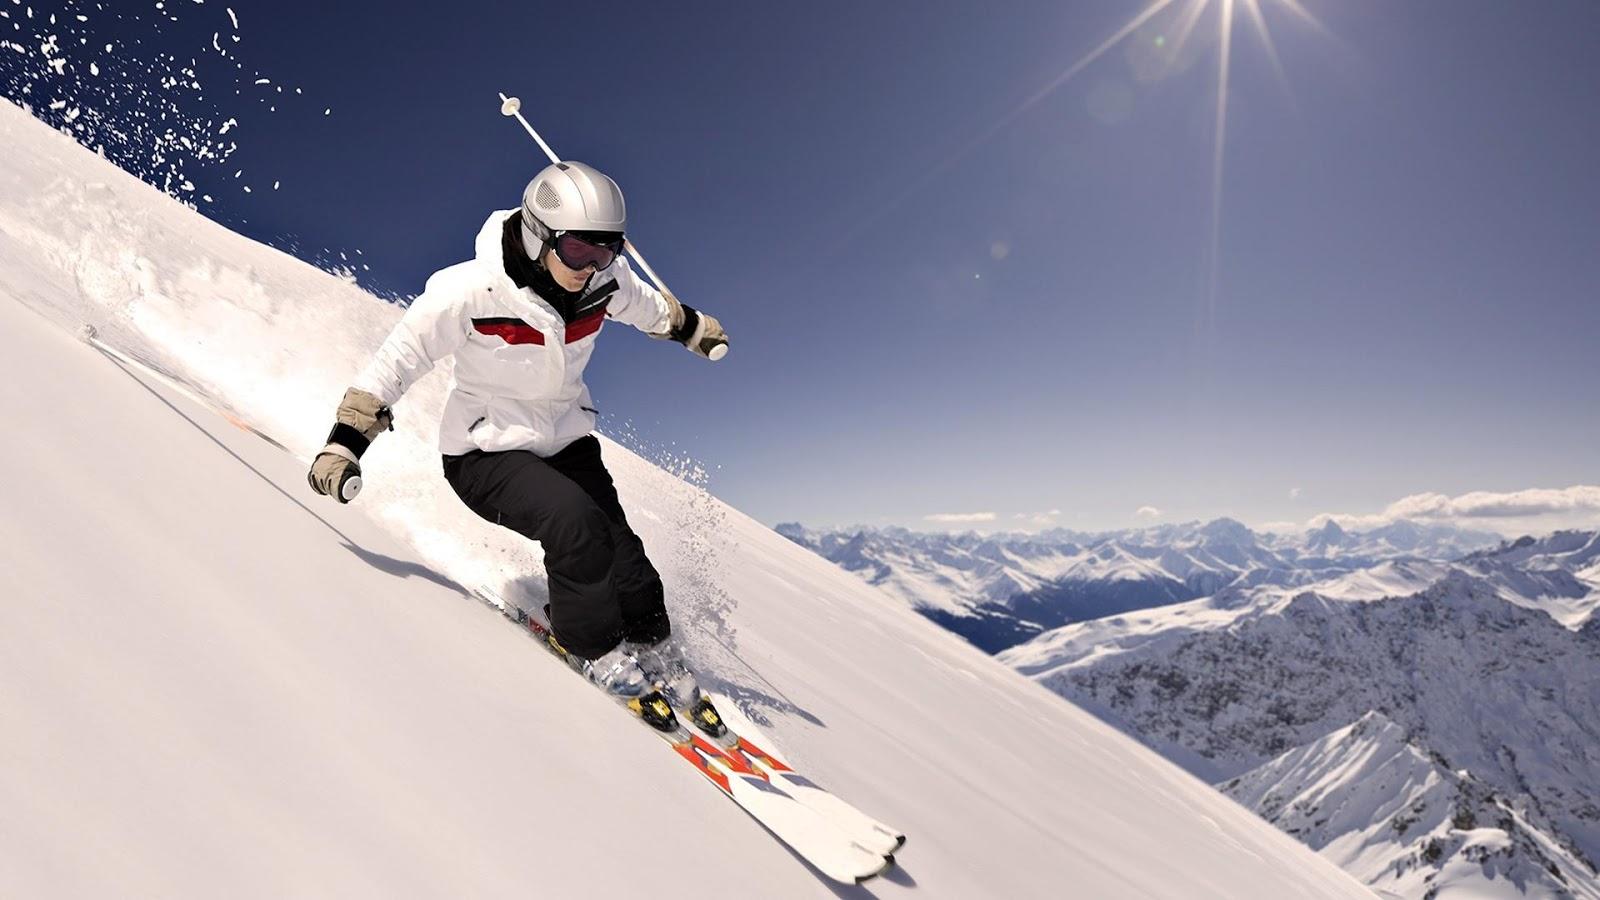 http://2.bp.blogspot.com/-h-M8WdfUTSM/UKohkUbgqWI/AAAAAAAAHLs/GsPMK94GKlk/s1600/Ski_Wallpaper_3.jpg